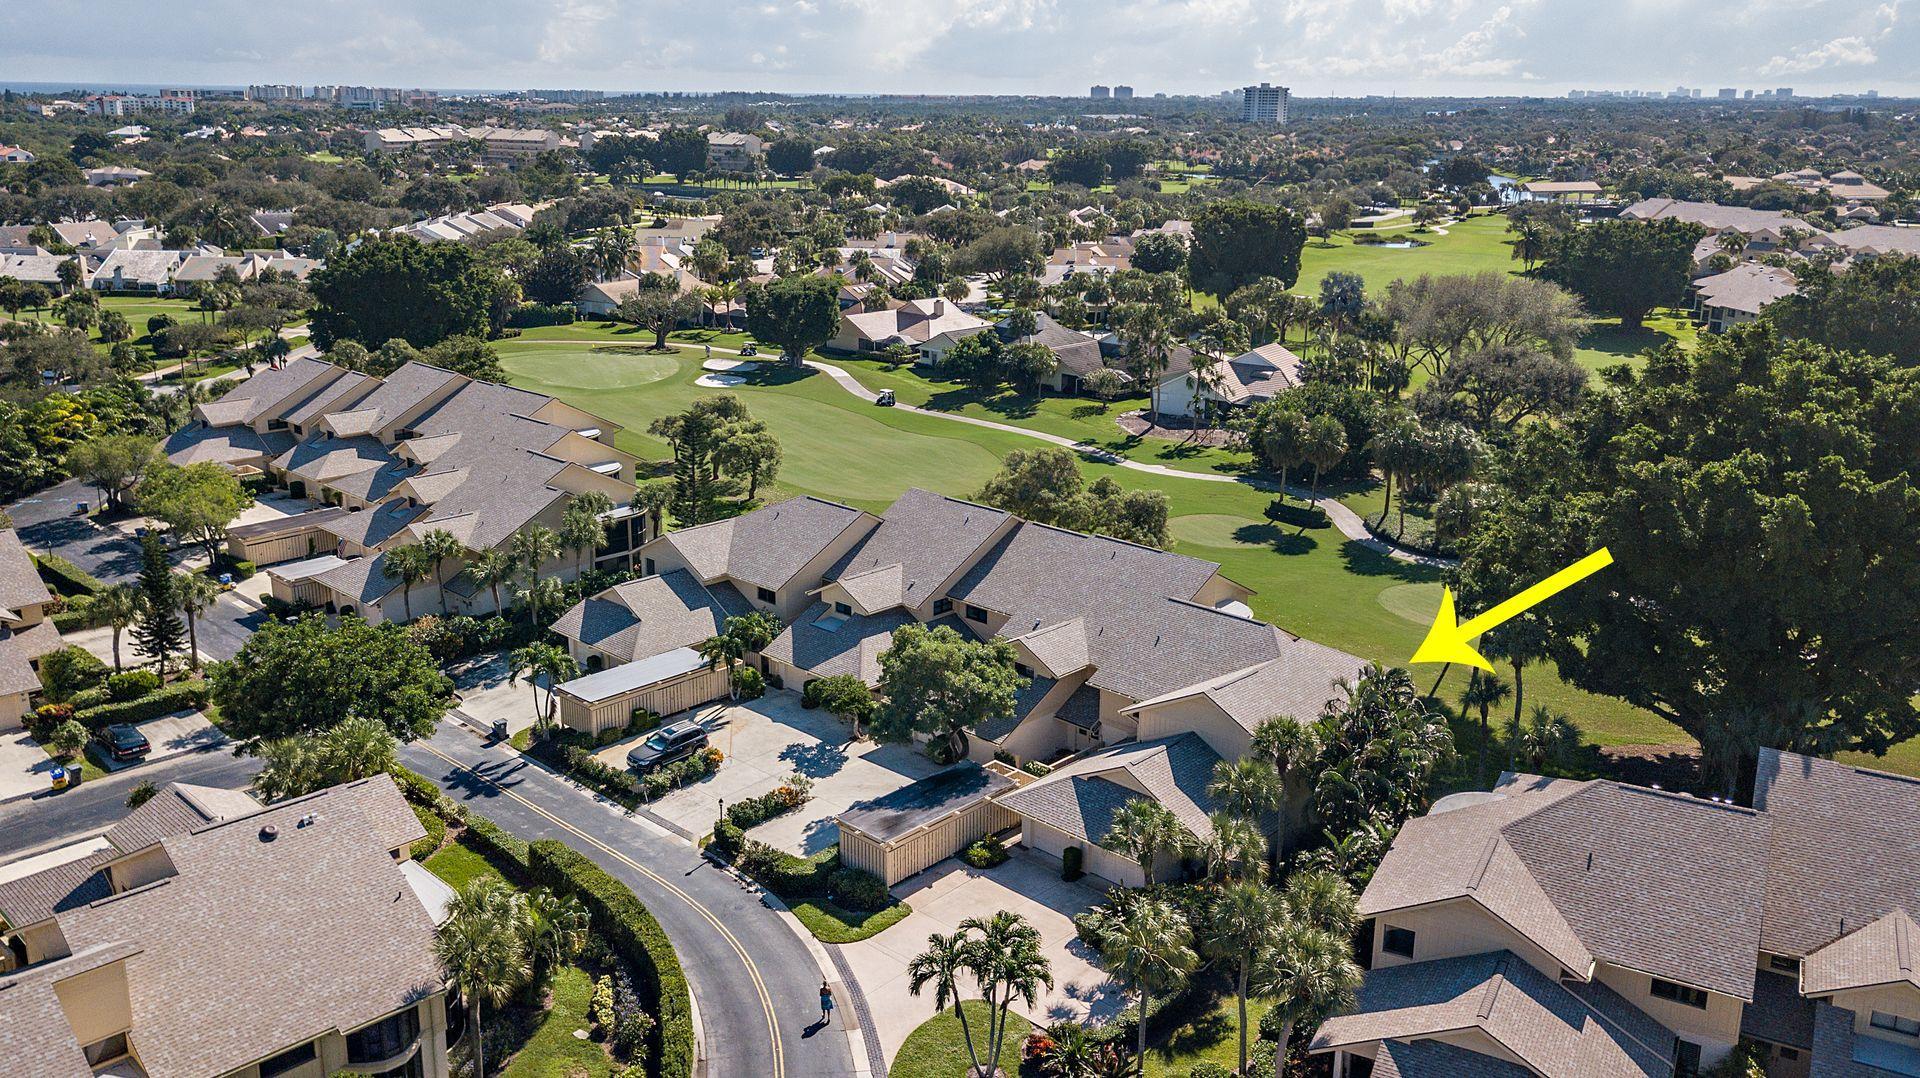 17138 Waterbend Drive 217, Jupiter, Florida 33477, 2 Bedrooms Bedrooms, ,2 BathroomsBathrooms,F,Condominium,Waterbend,RX-10705781